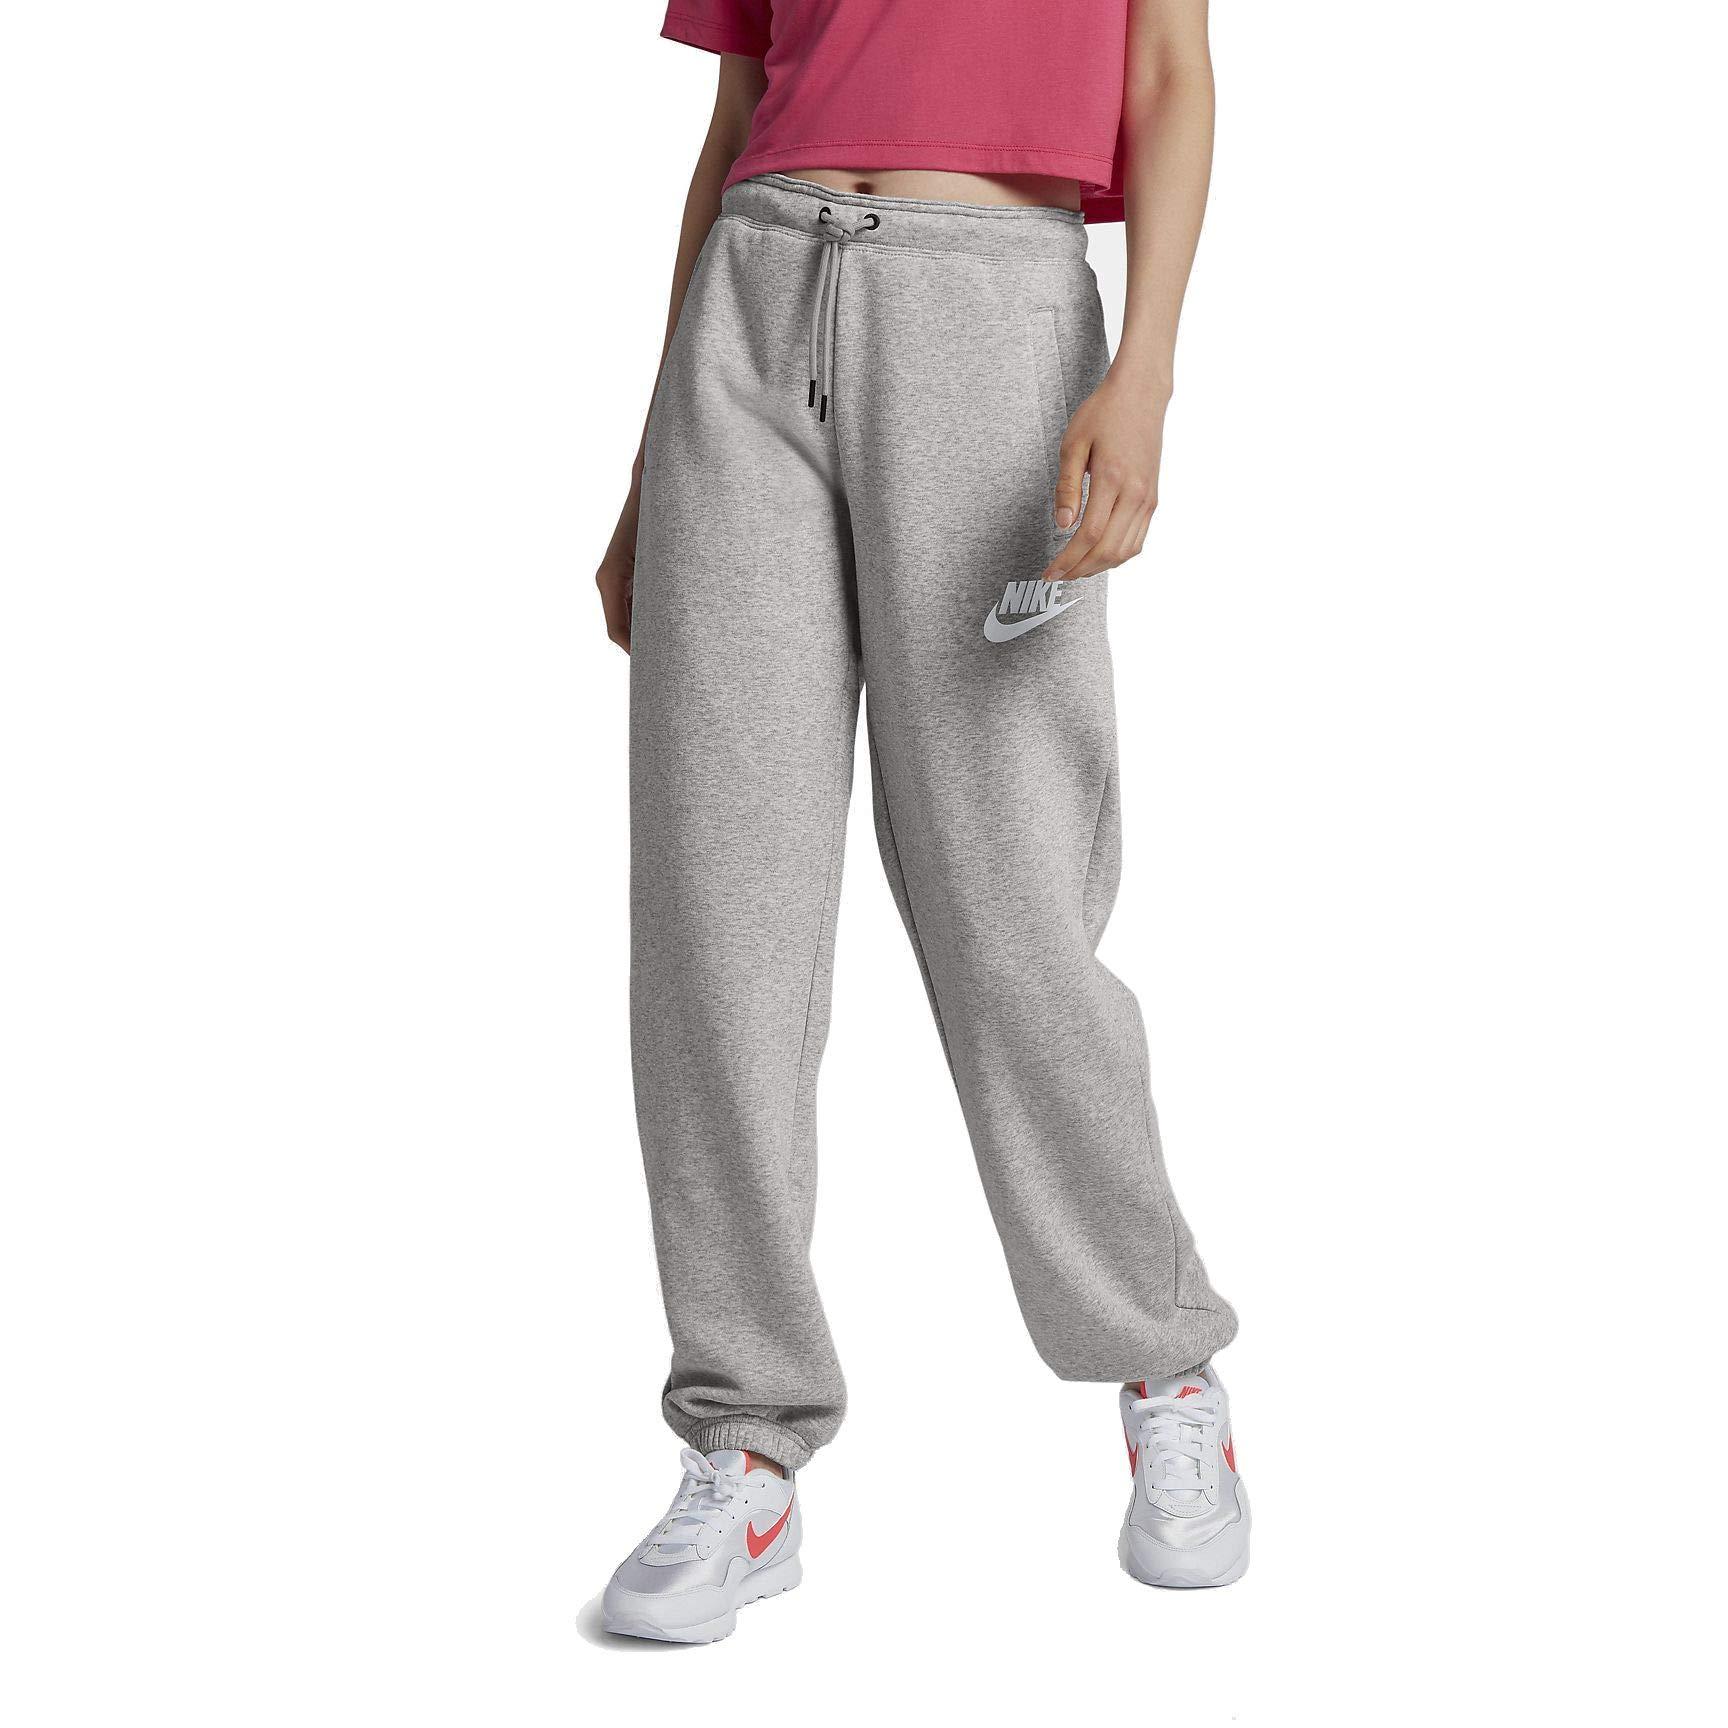 Nike Sportswear Rally Loose Women's Fleece Pants (Grey Heather/Pale Grey/White, Medium)